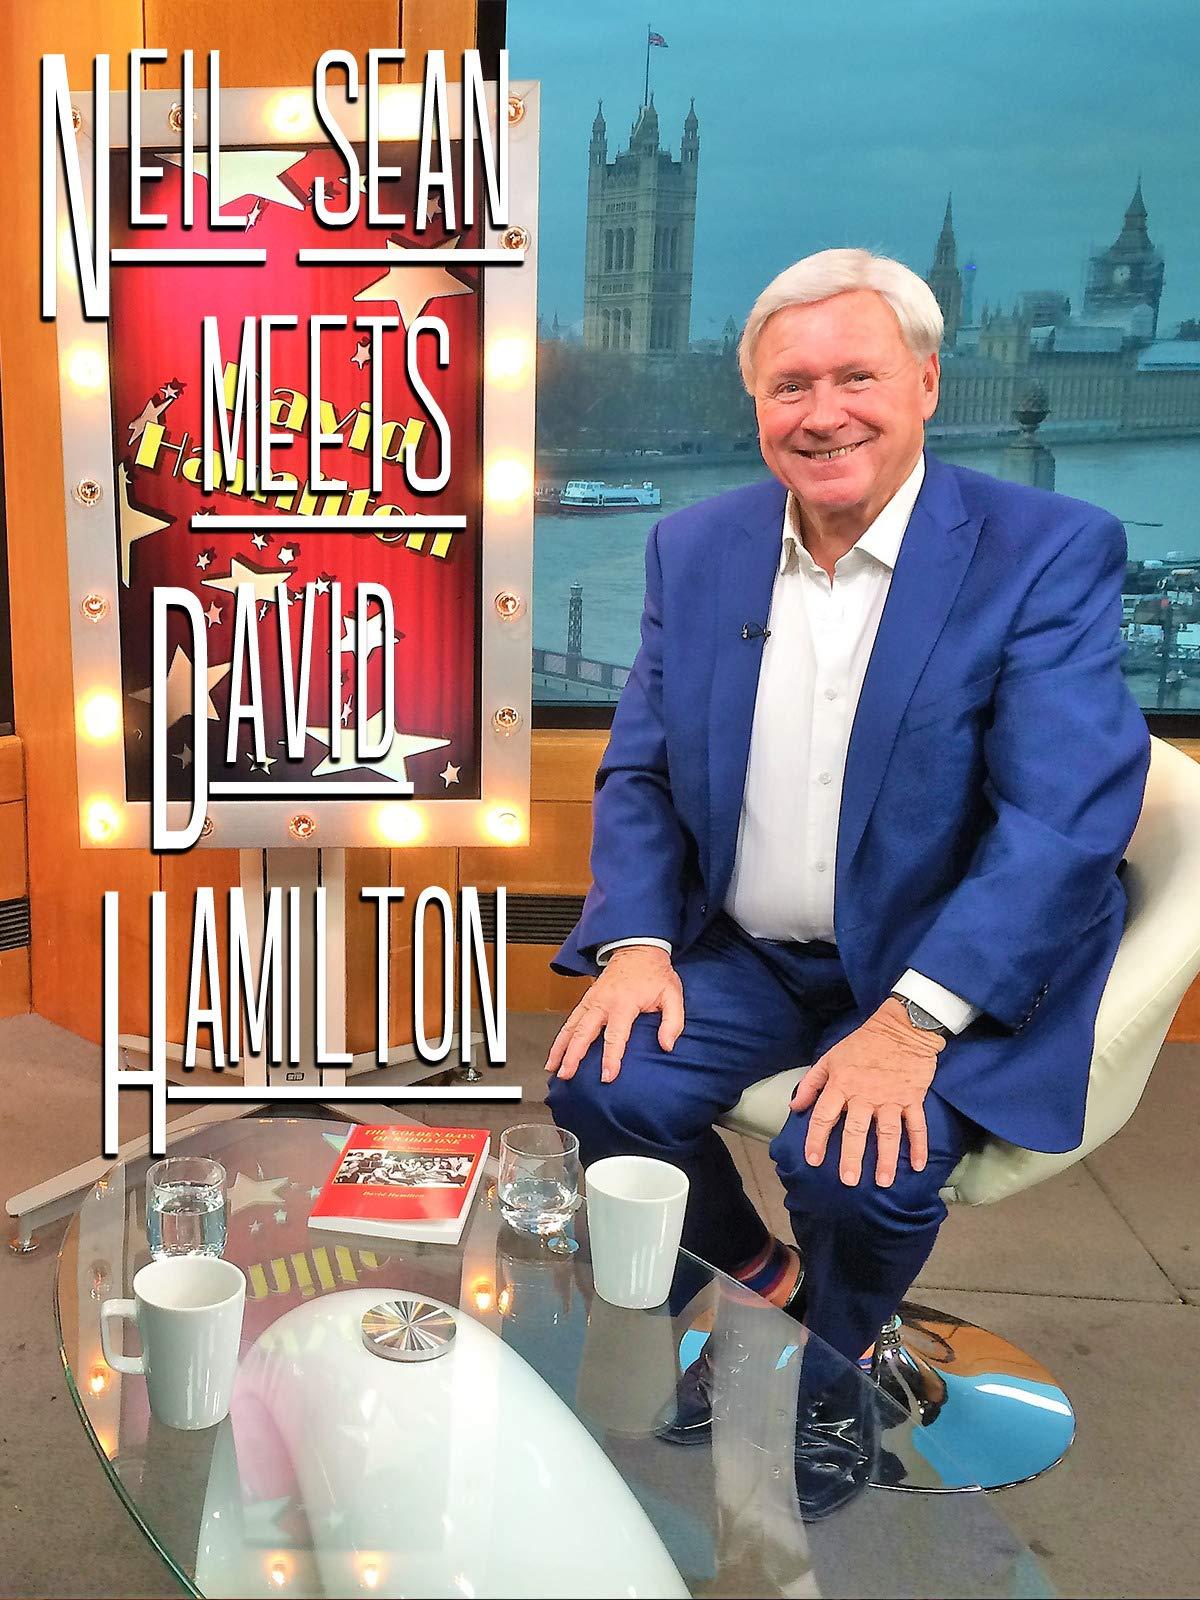 Neil Sean meets David Hamilton on Amazon Prime Video UK